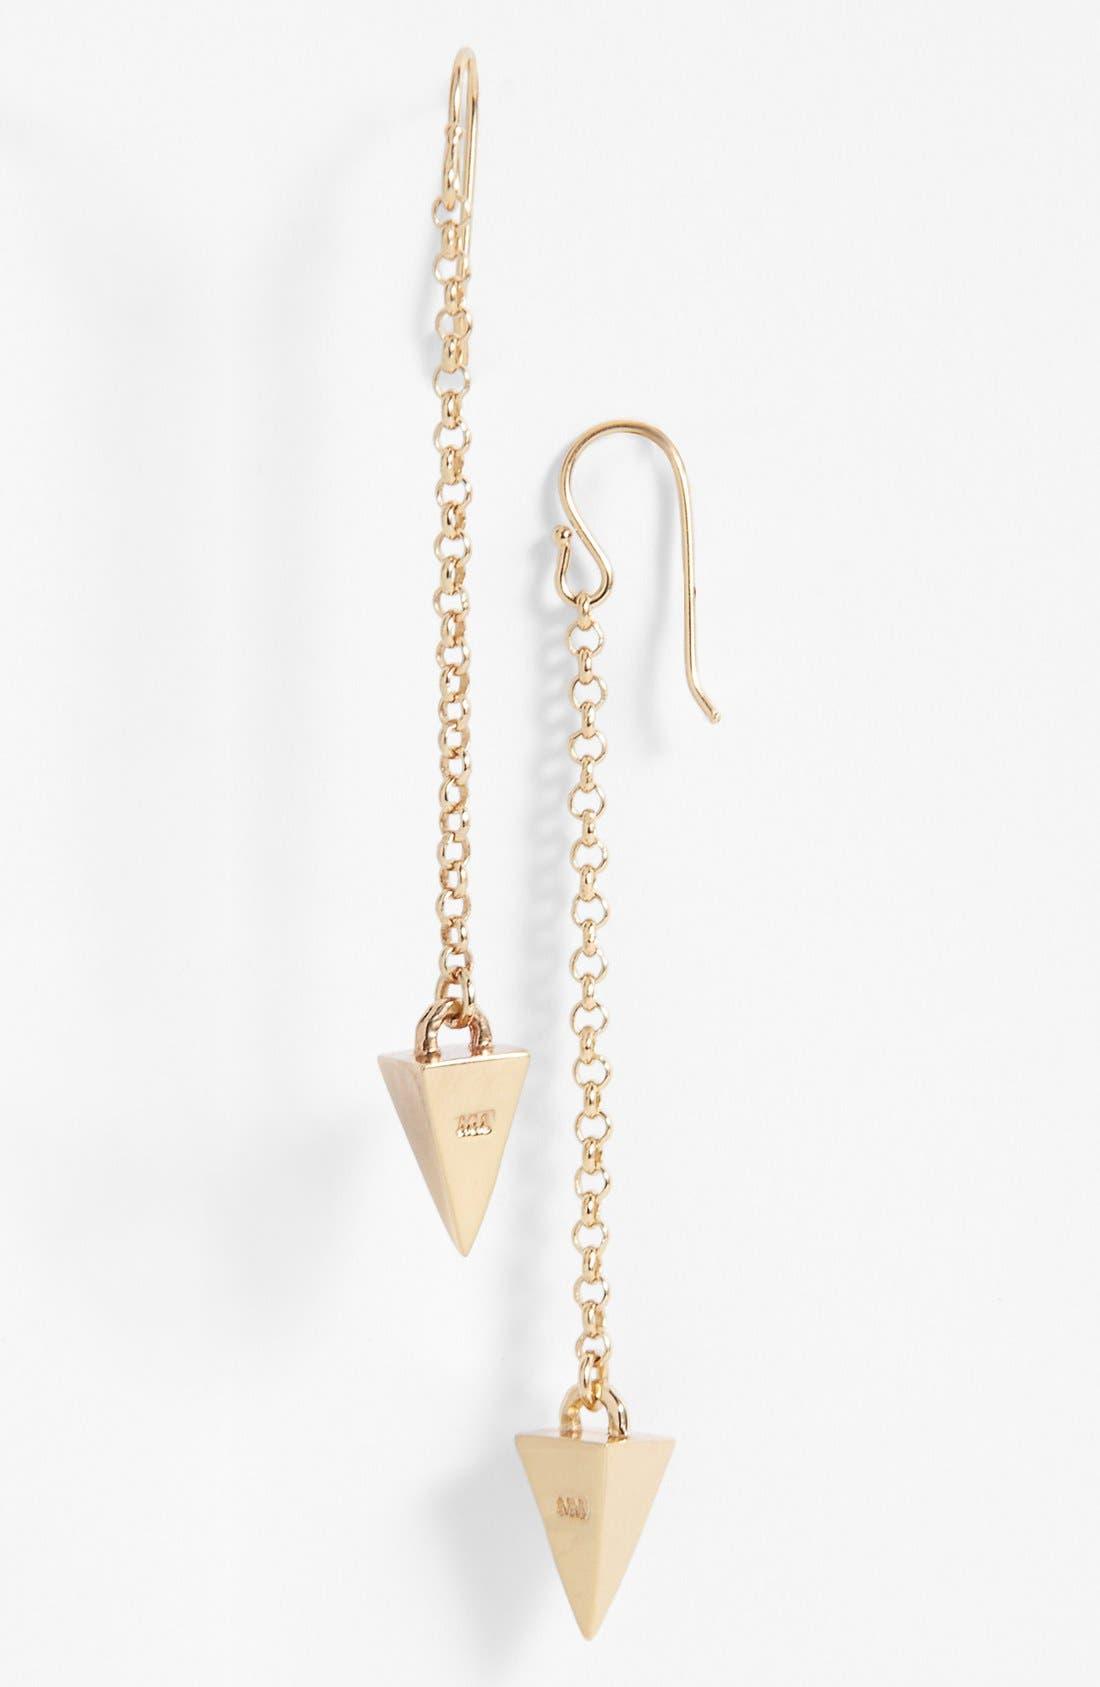 Alternate Image 1 Selected - Melinda Maria 'Pyramid' Linear Earrings